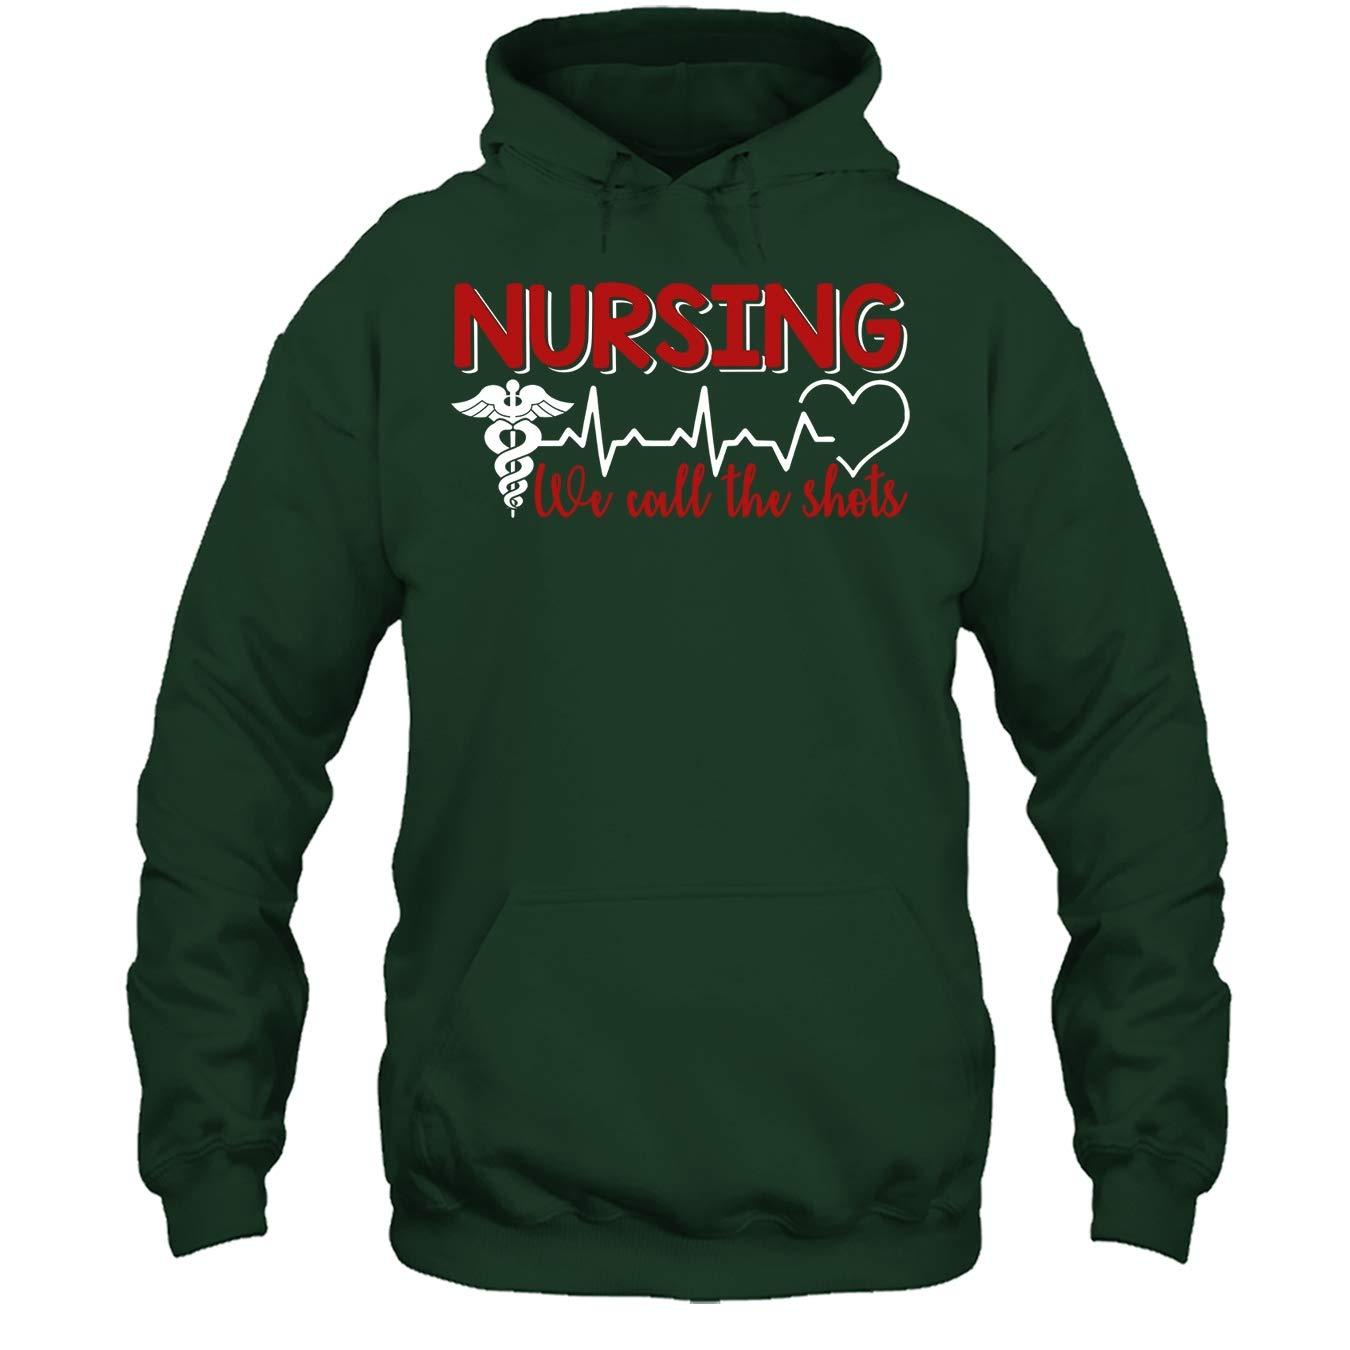 Nurser Tshirt Design Nursing We Call The Shots T Shirt